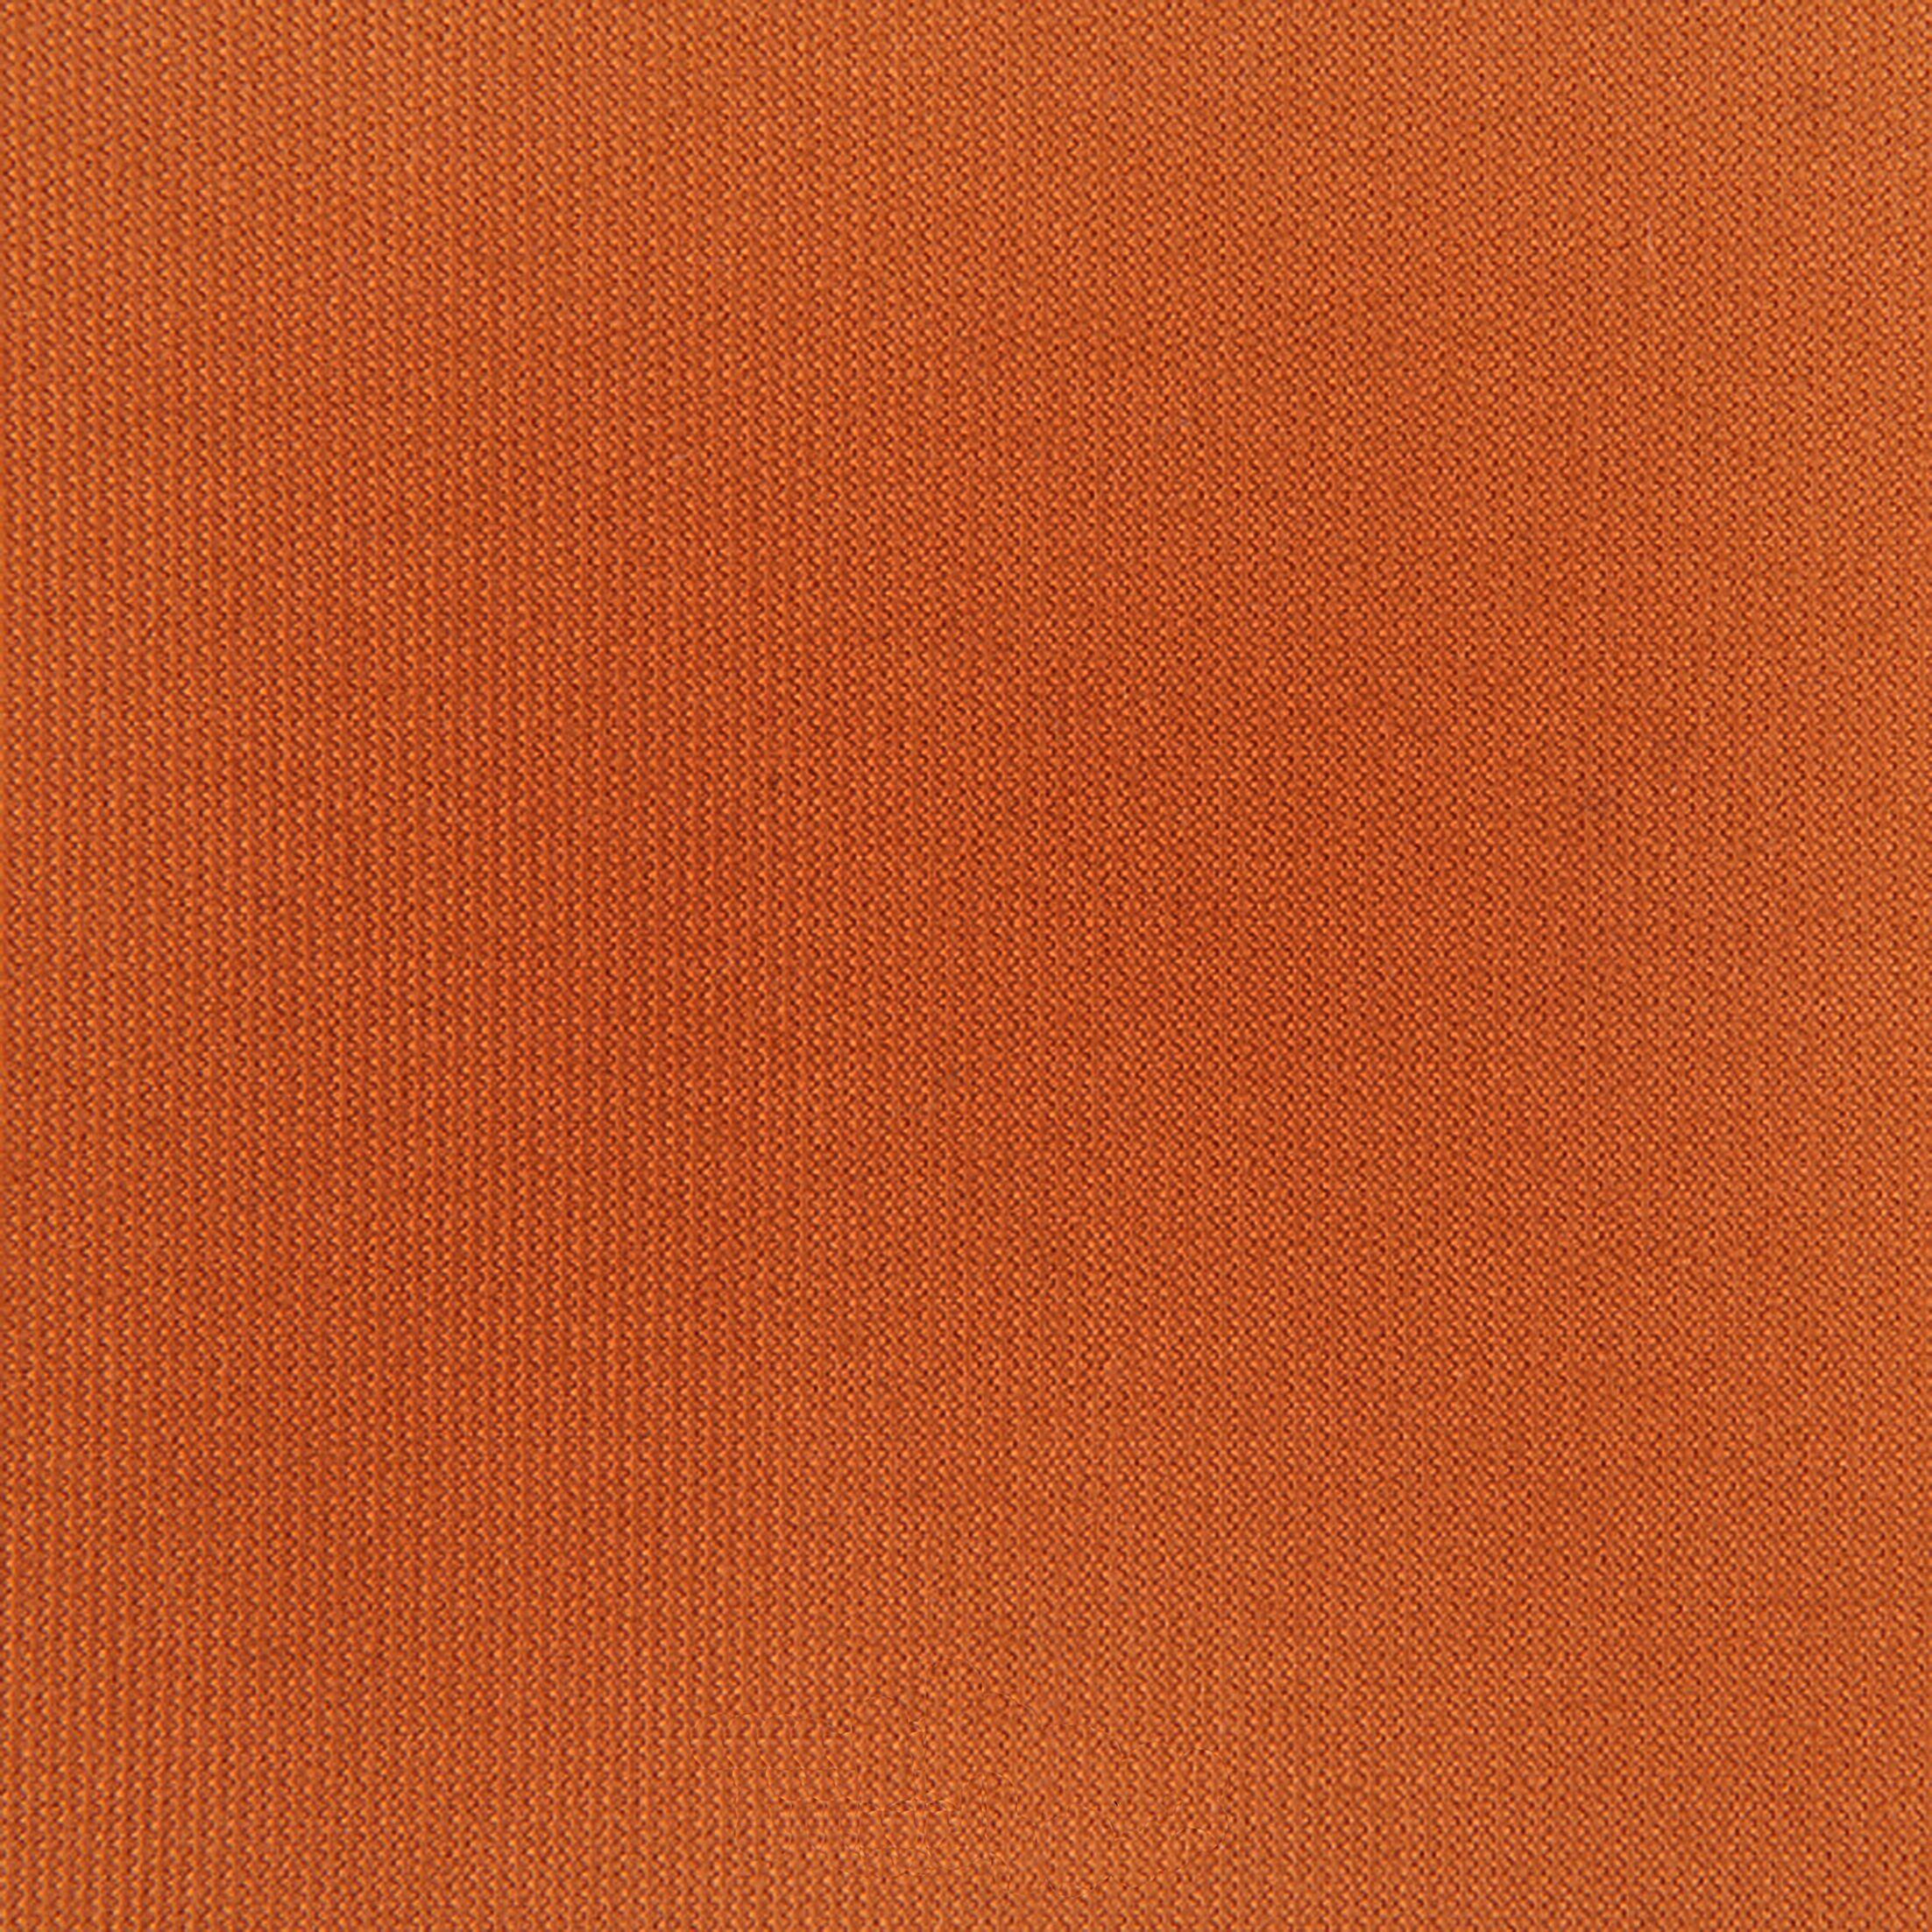 Indoor/Outdoor Sunbrella Lounge Chair Cushion Fabric: Canvas Rust, Size: 23.5